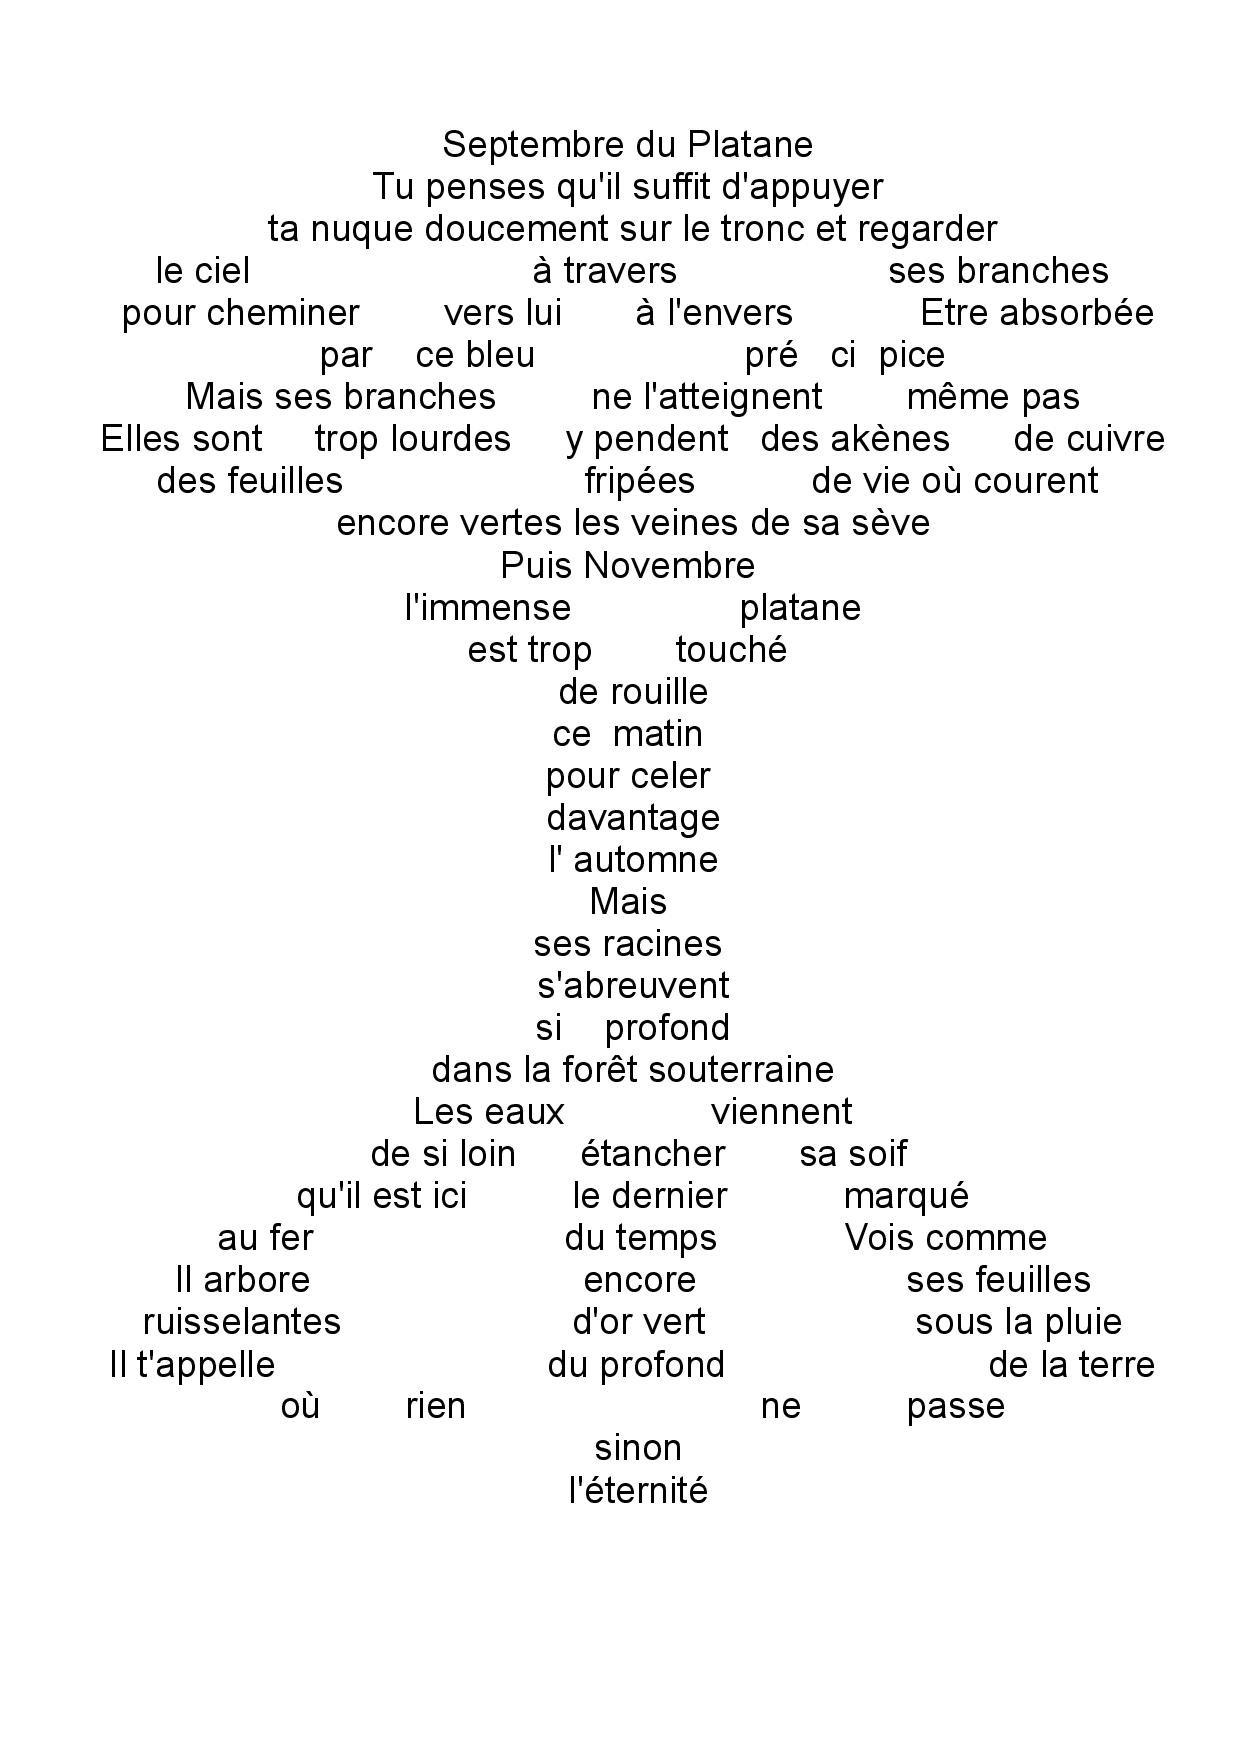 Le Platane pdf-page-001 (1)